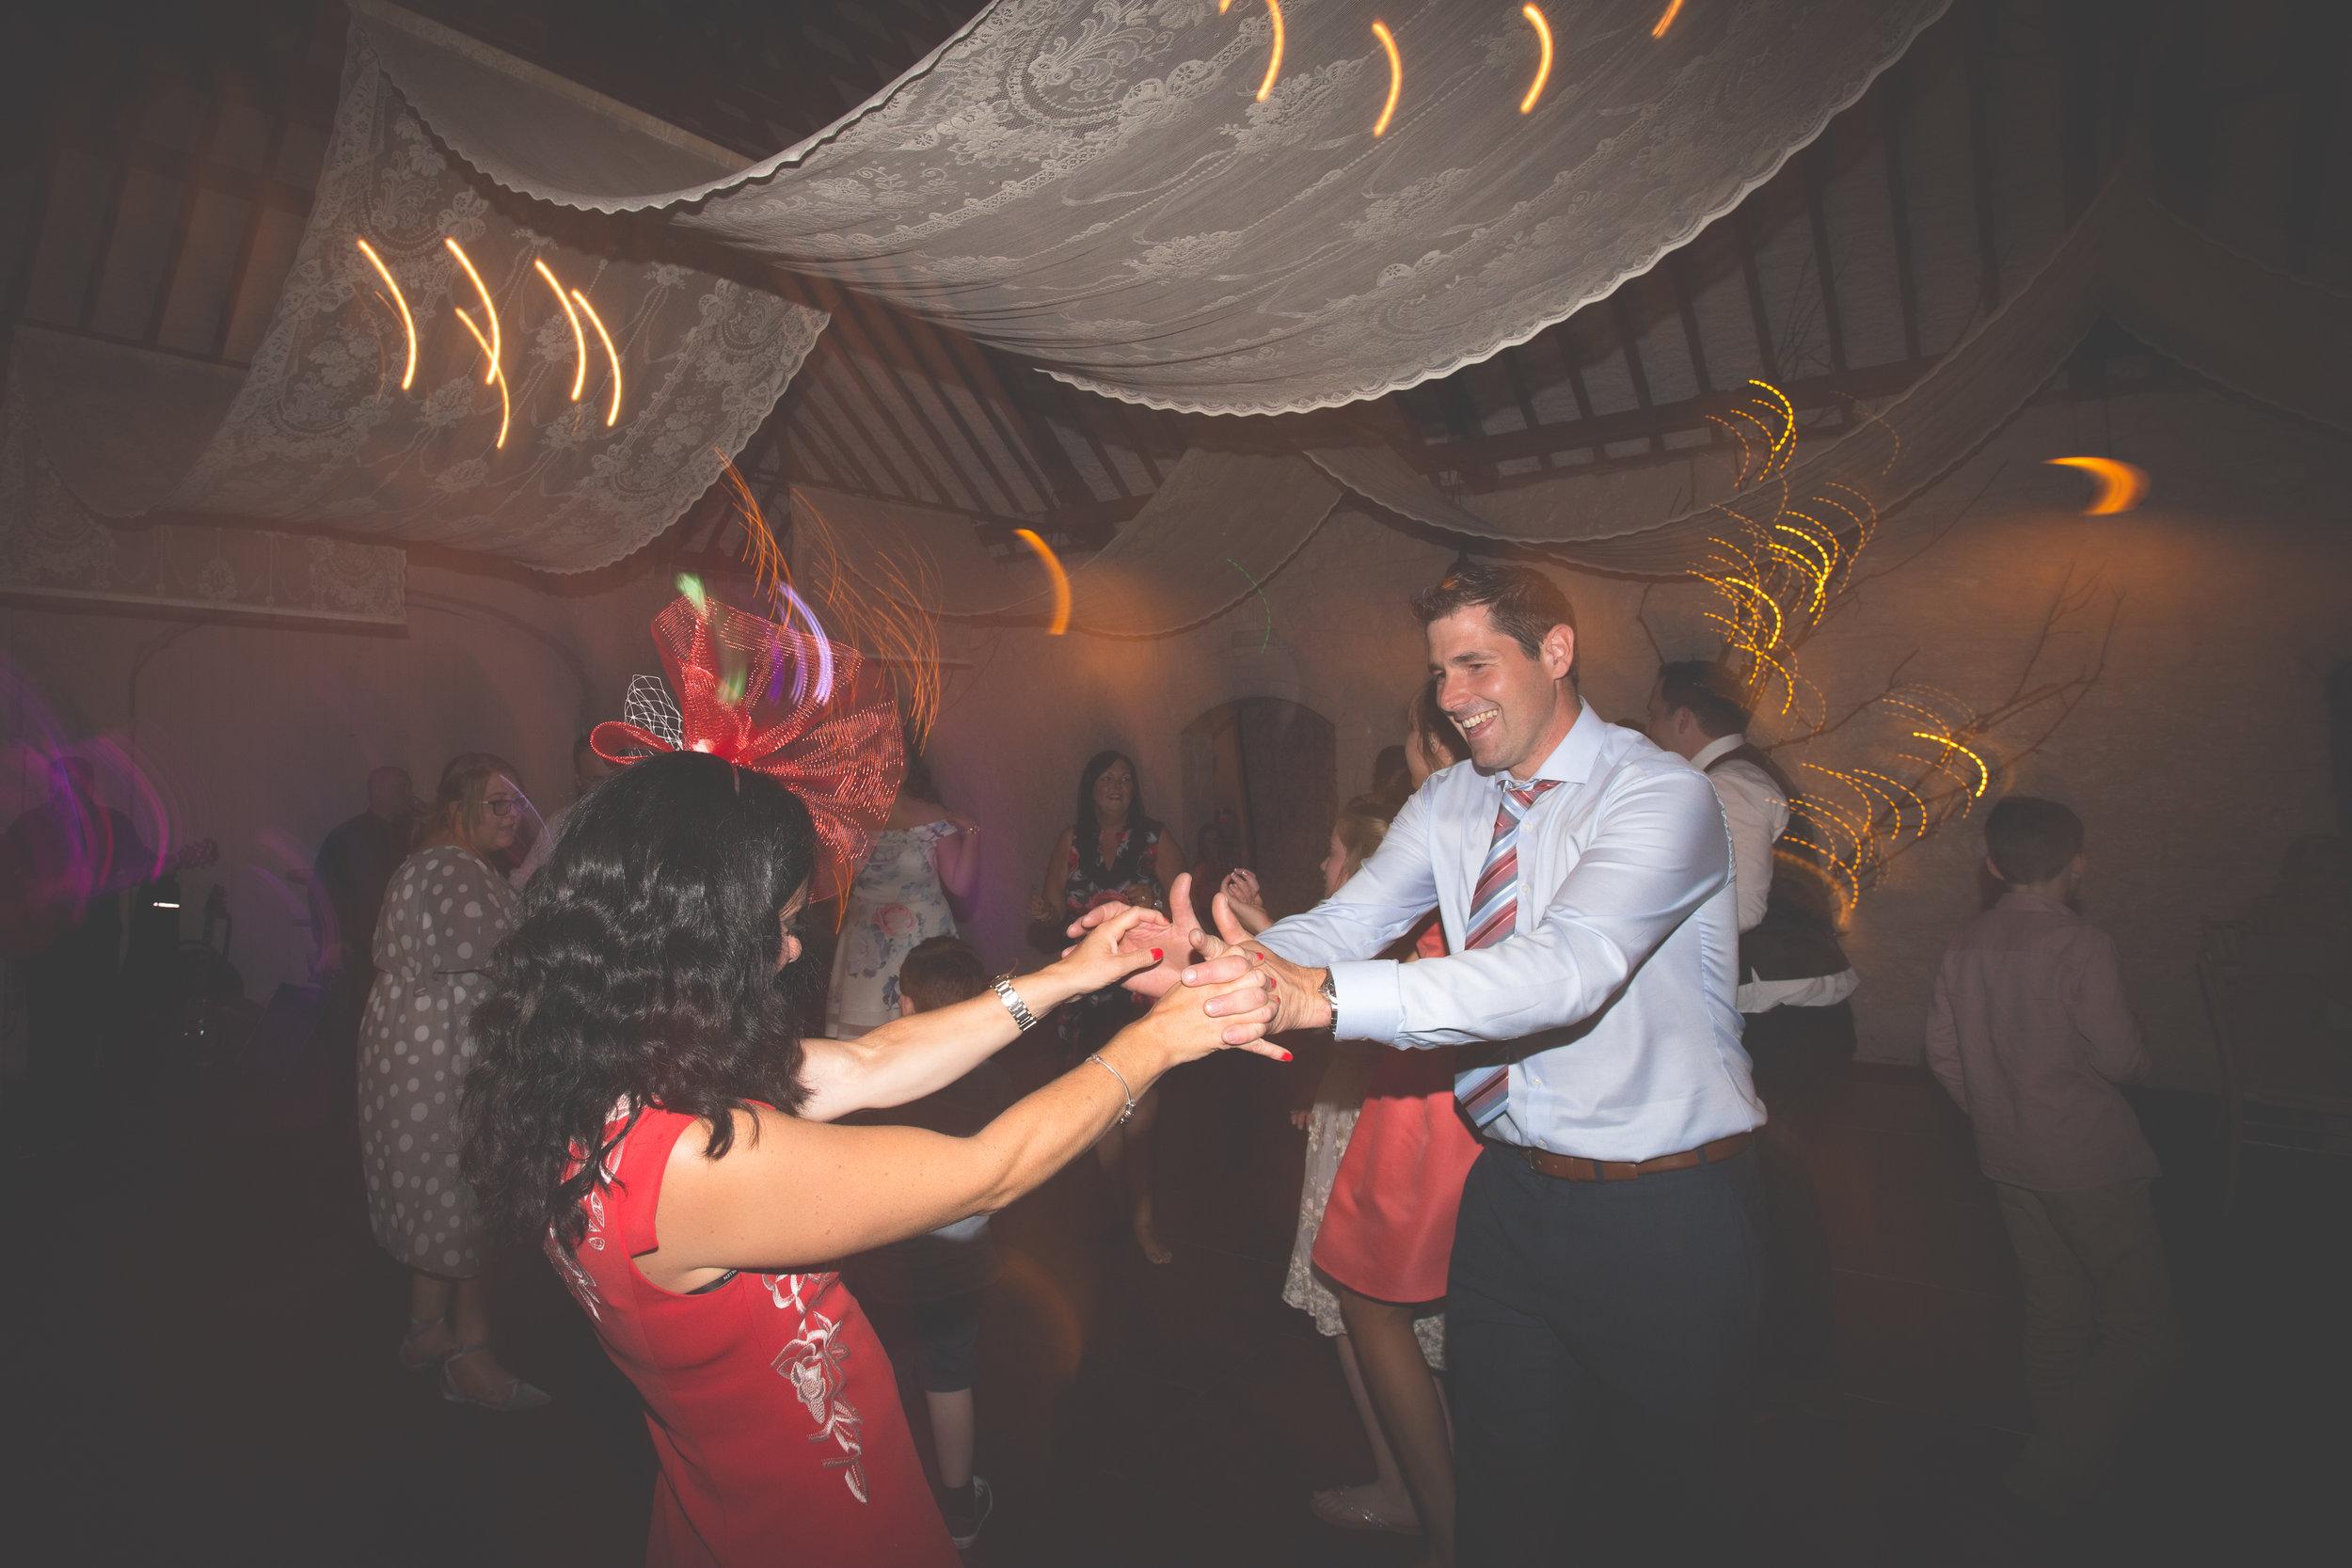 Brian McEwan Wedding Photography | Carol-Annee & Sean | The Dancing-81.jpg